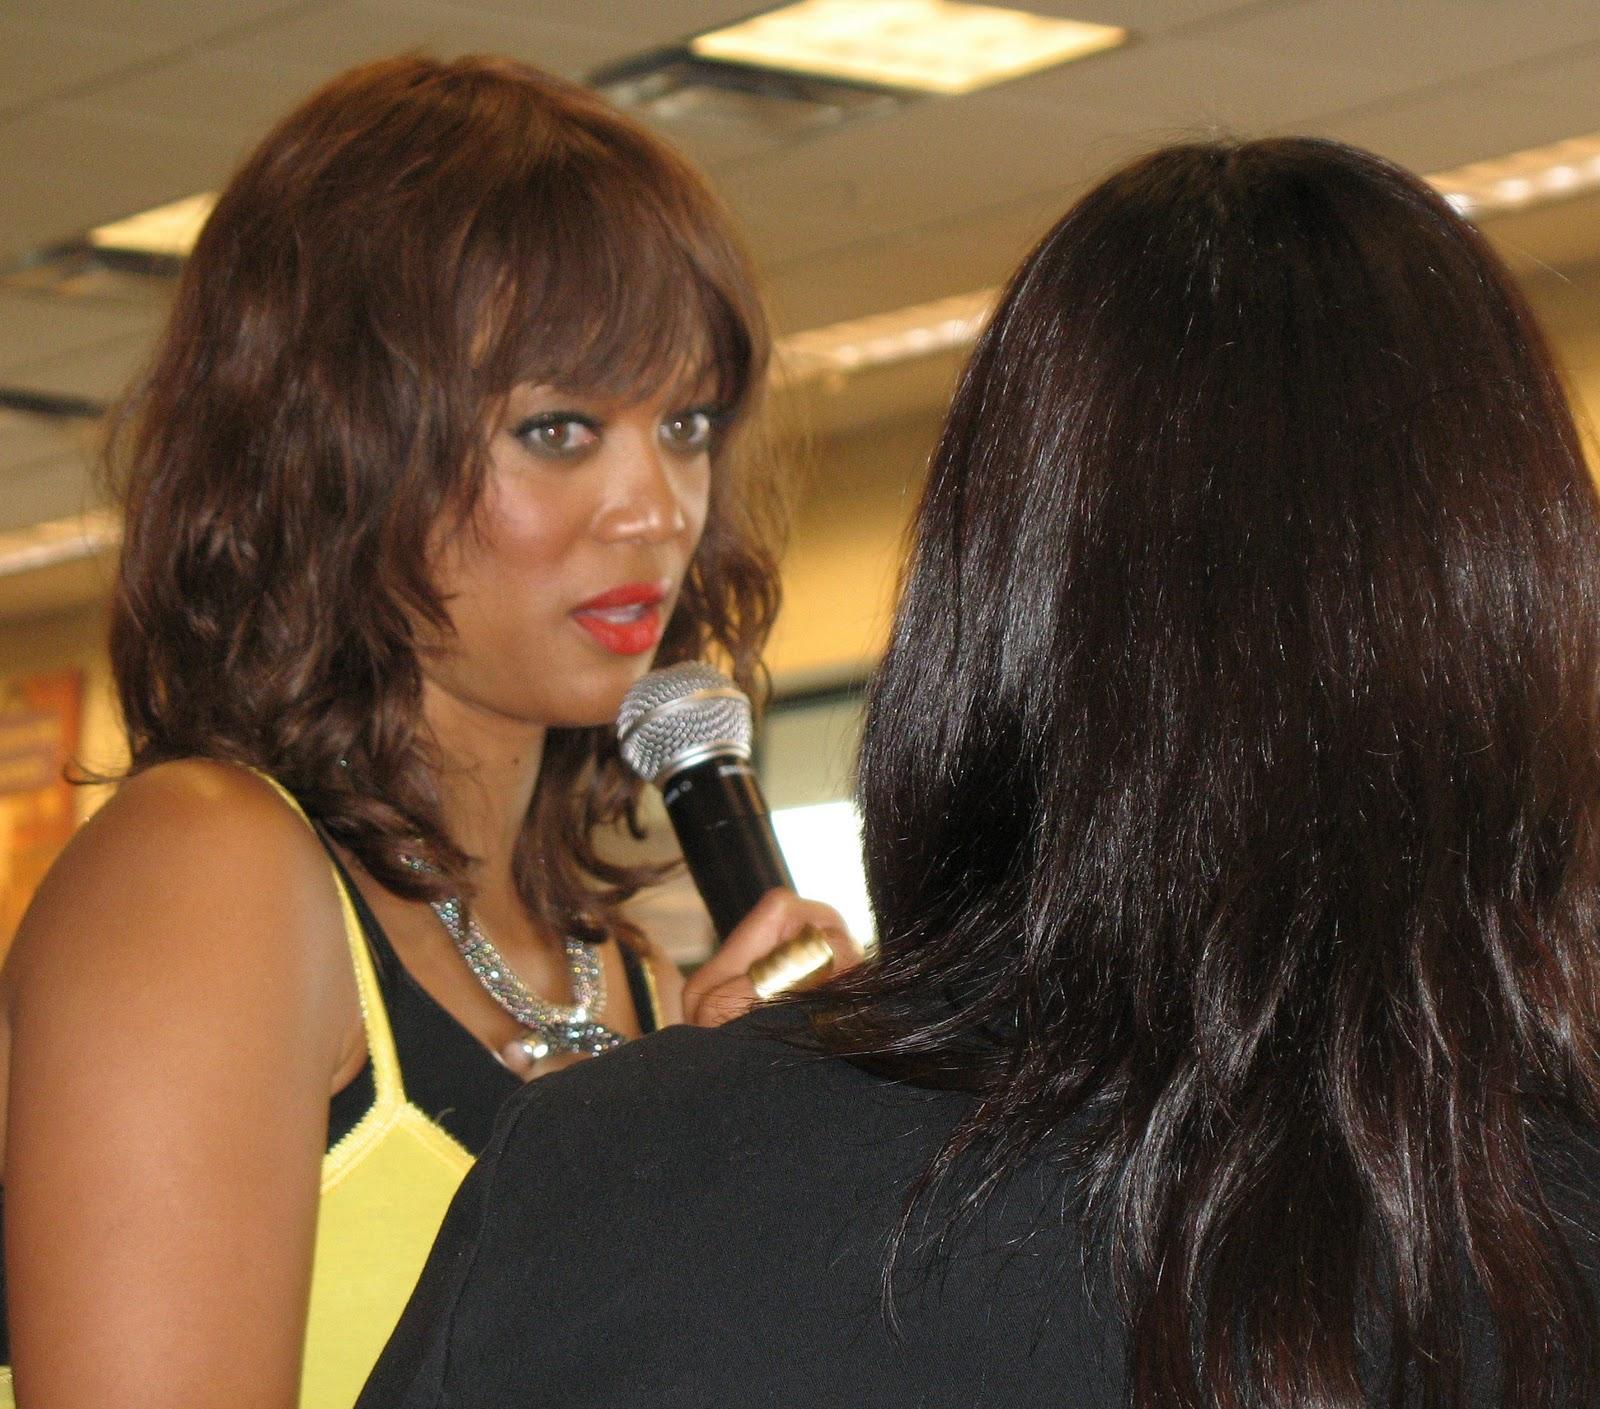 Tyra Banks Modelland: Tyra Banks Modelland B&N Southlake